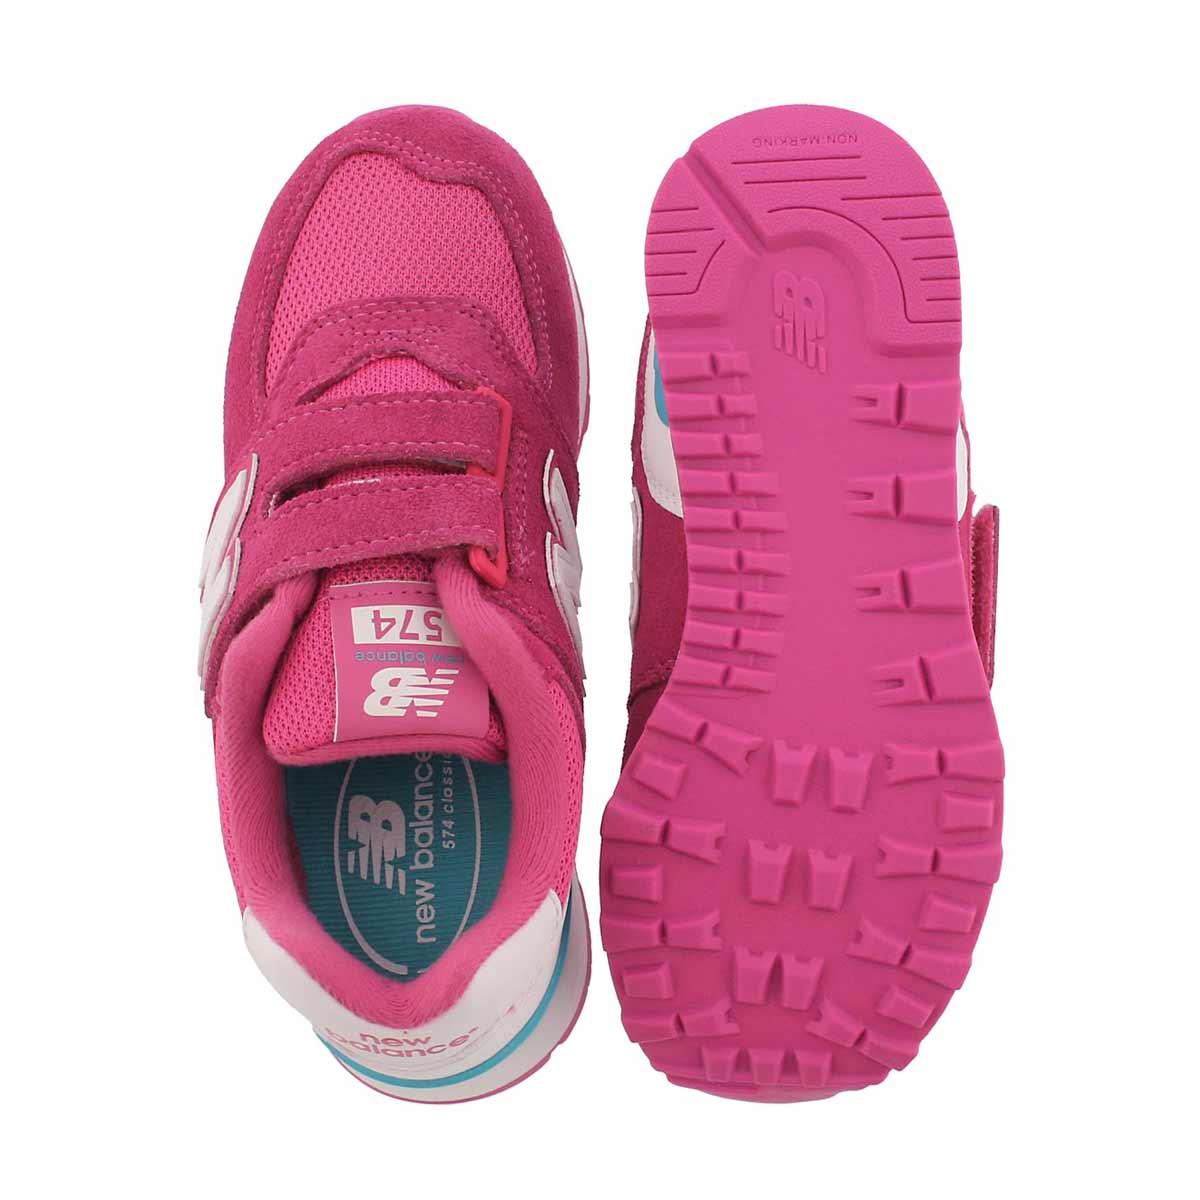 Grls 574 pink/white sneaker